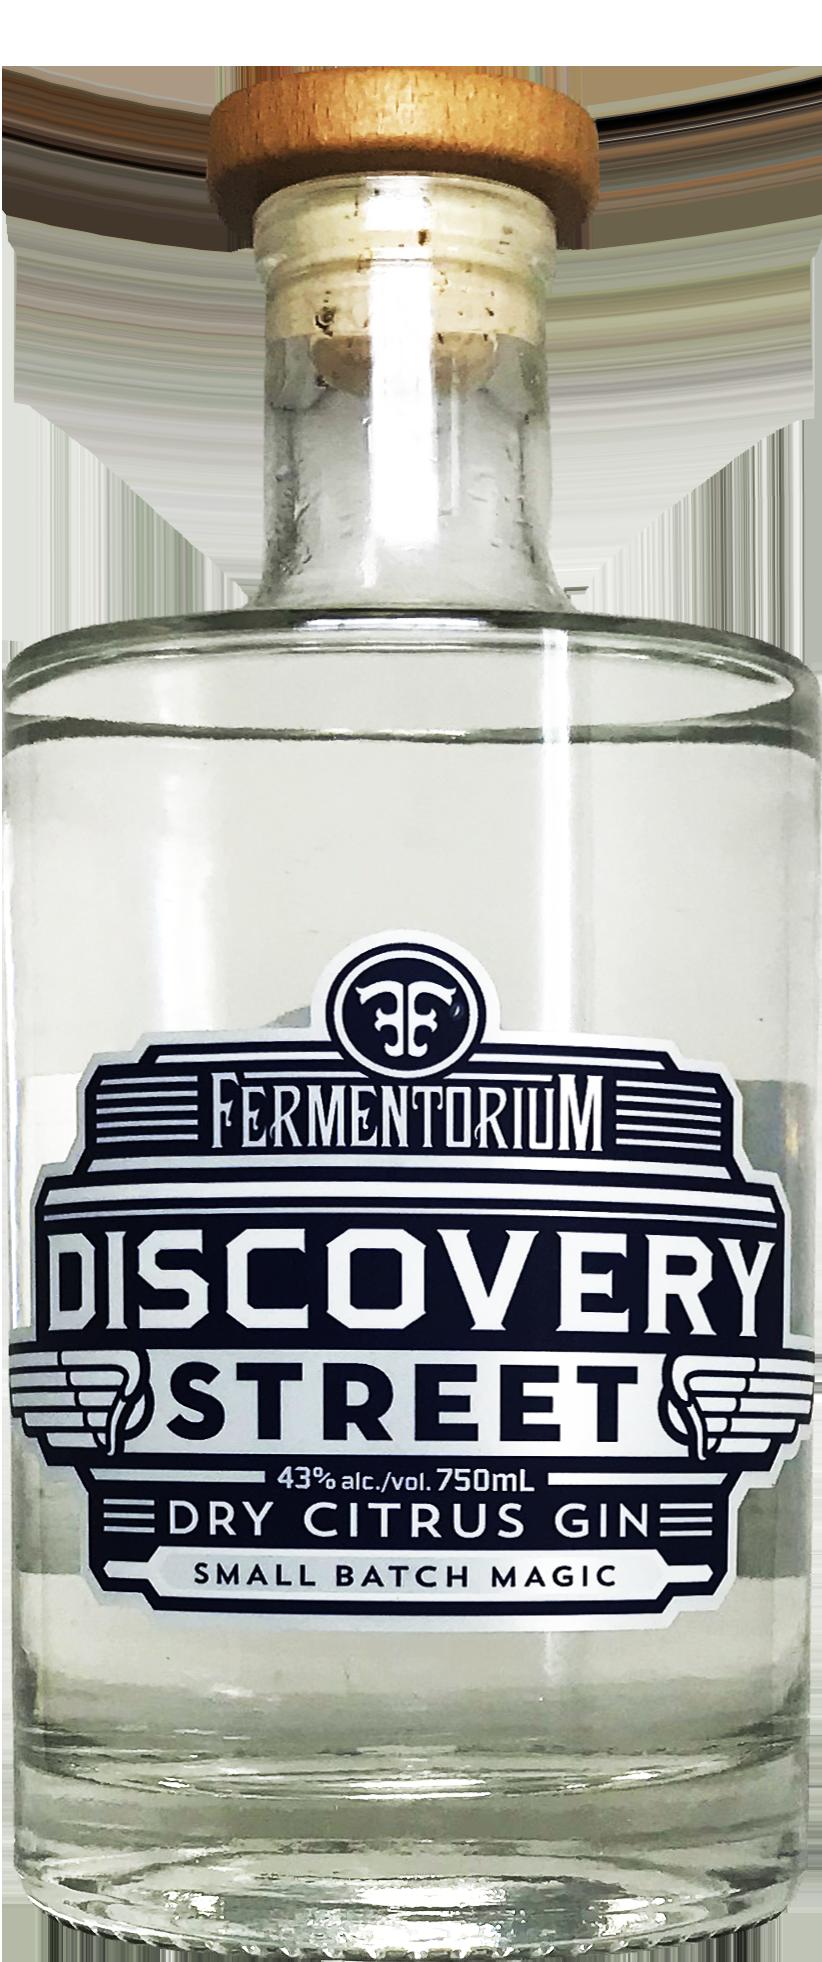 Image Courtesy of Fermentorium Distilling Co.